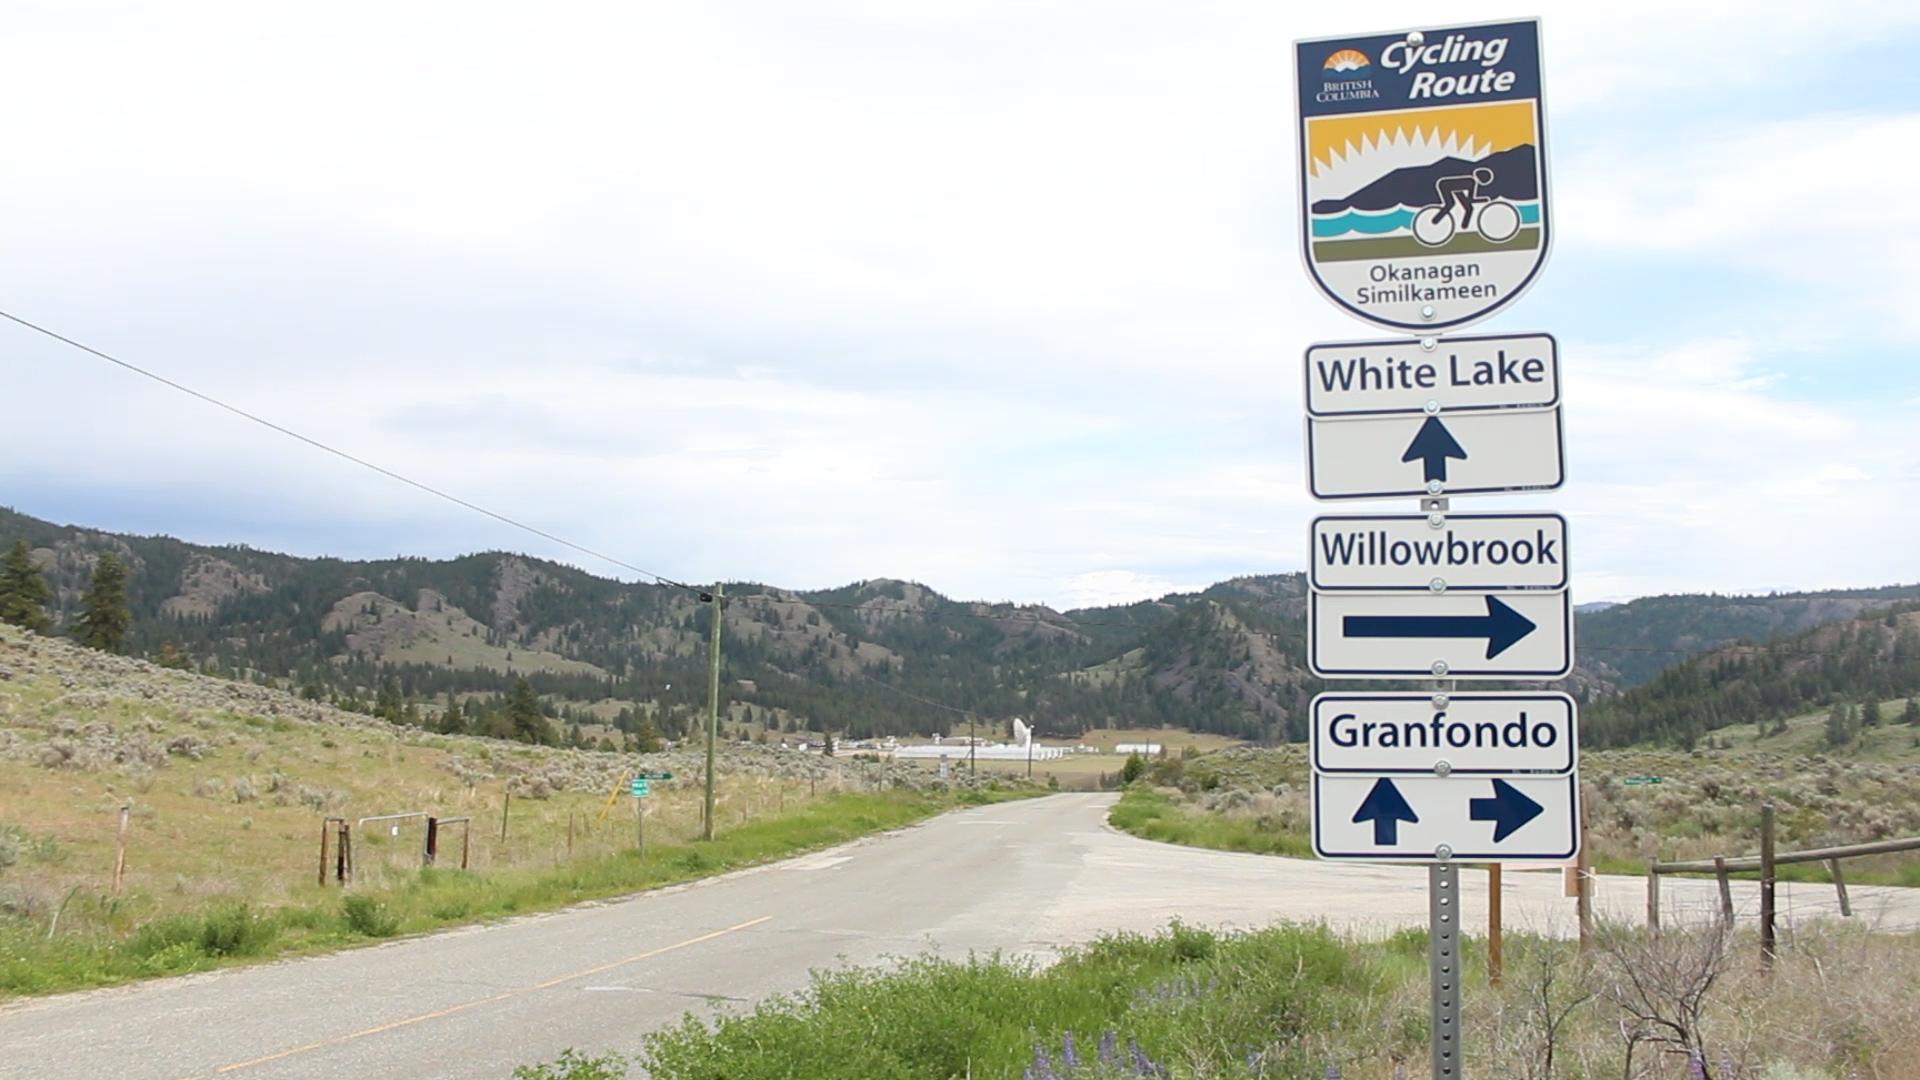 Cycling Sign - White Lake Willowbrook.jpg